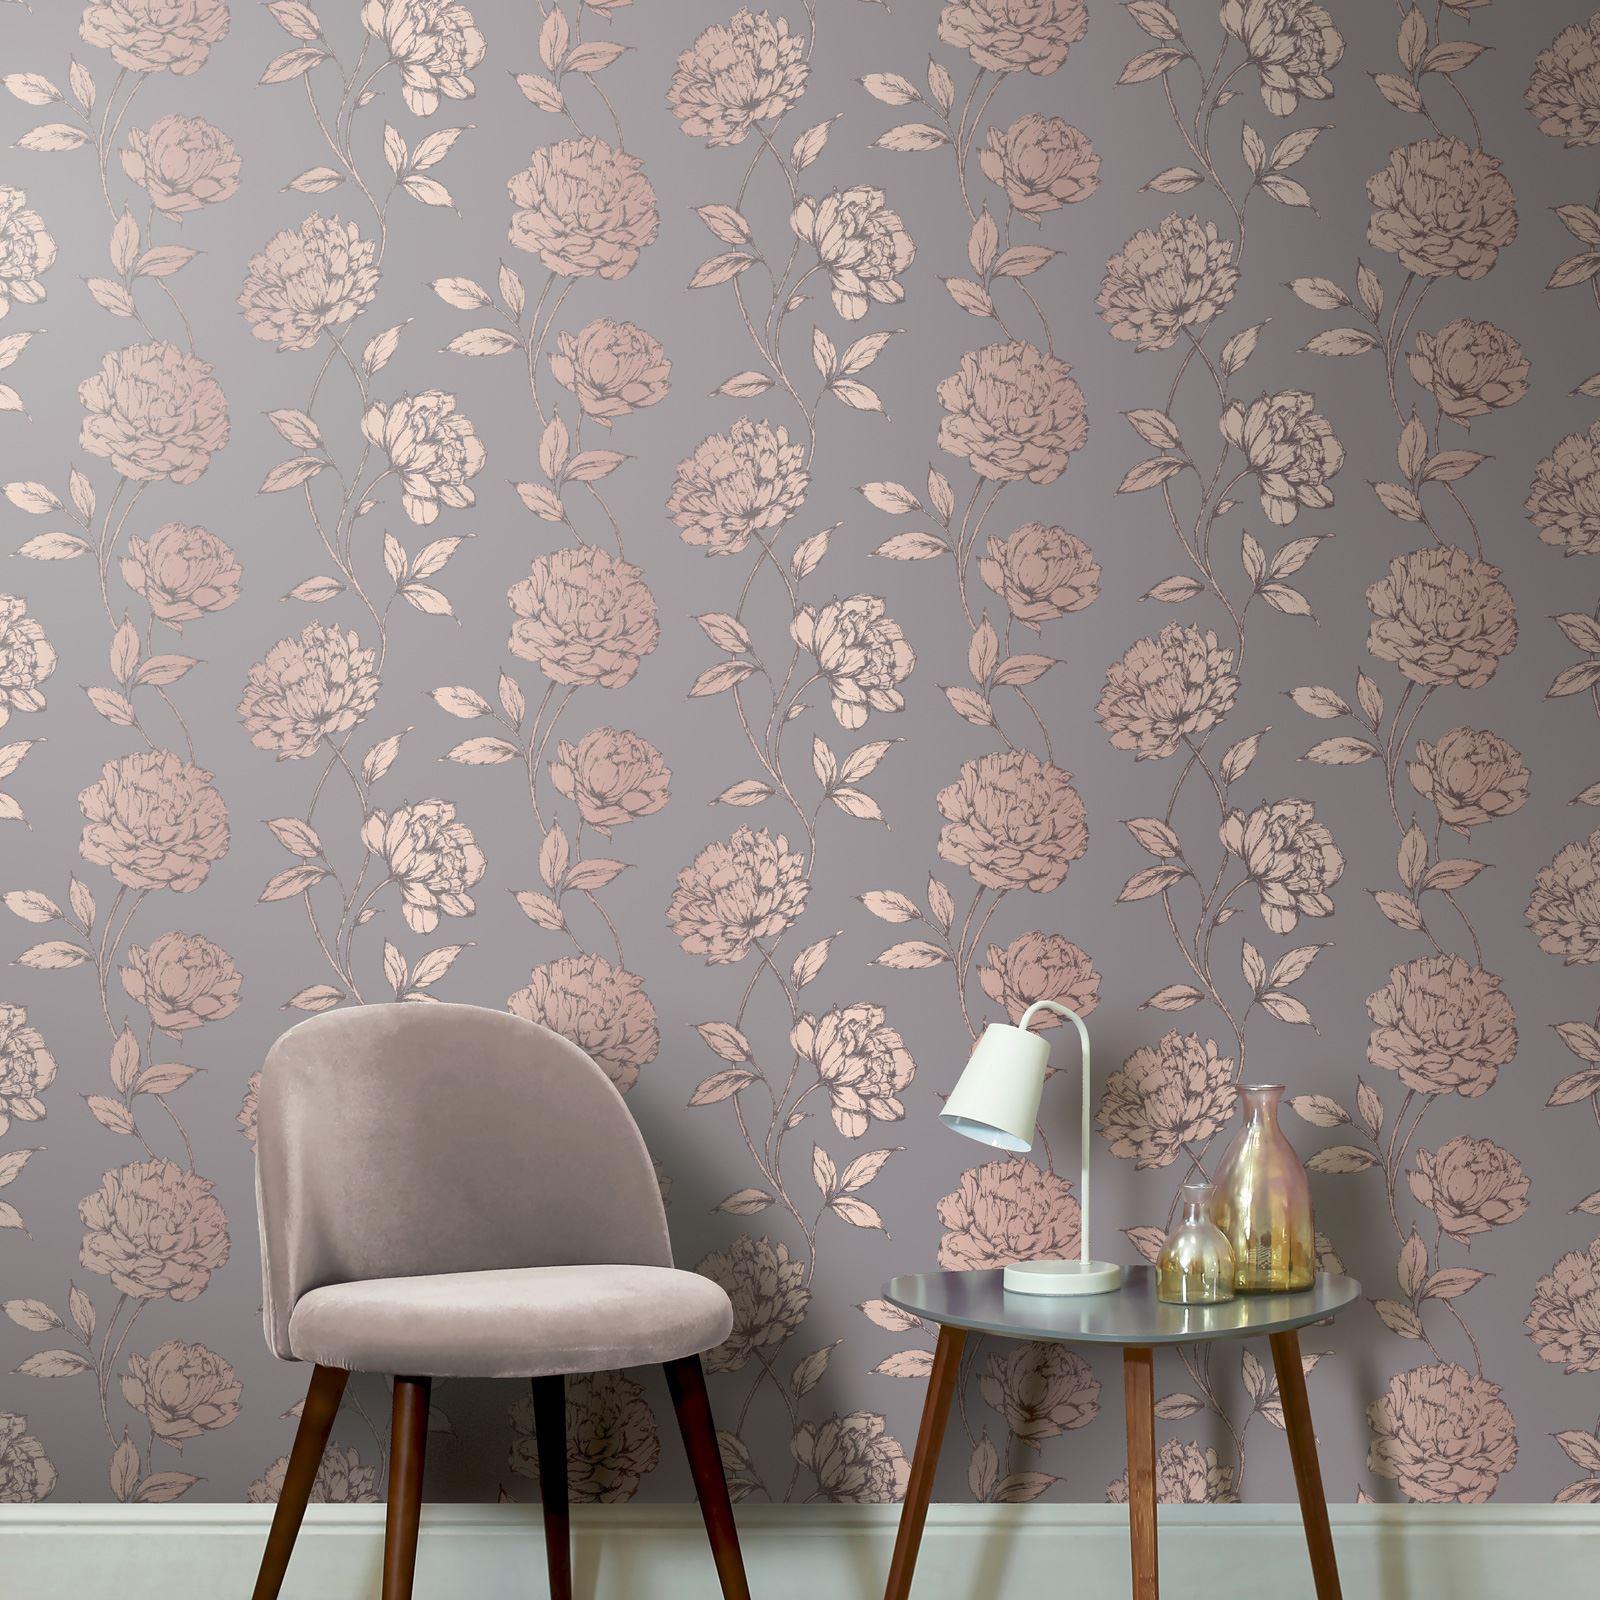 Pretty Metallic Floral Wallpaper 688001 Charcoal Arthouse Lounges